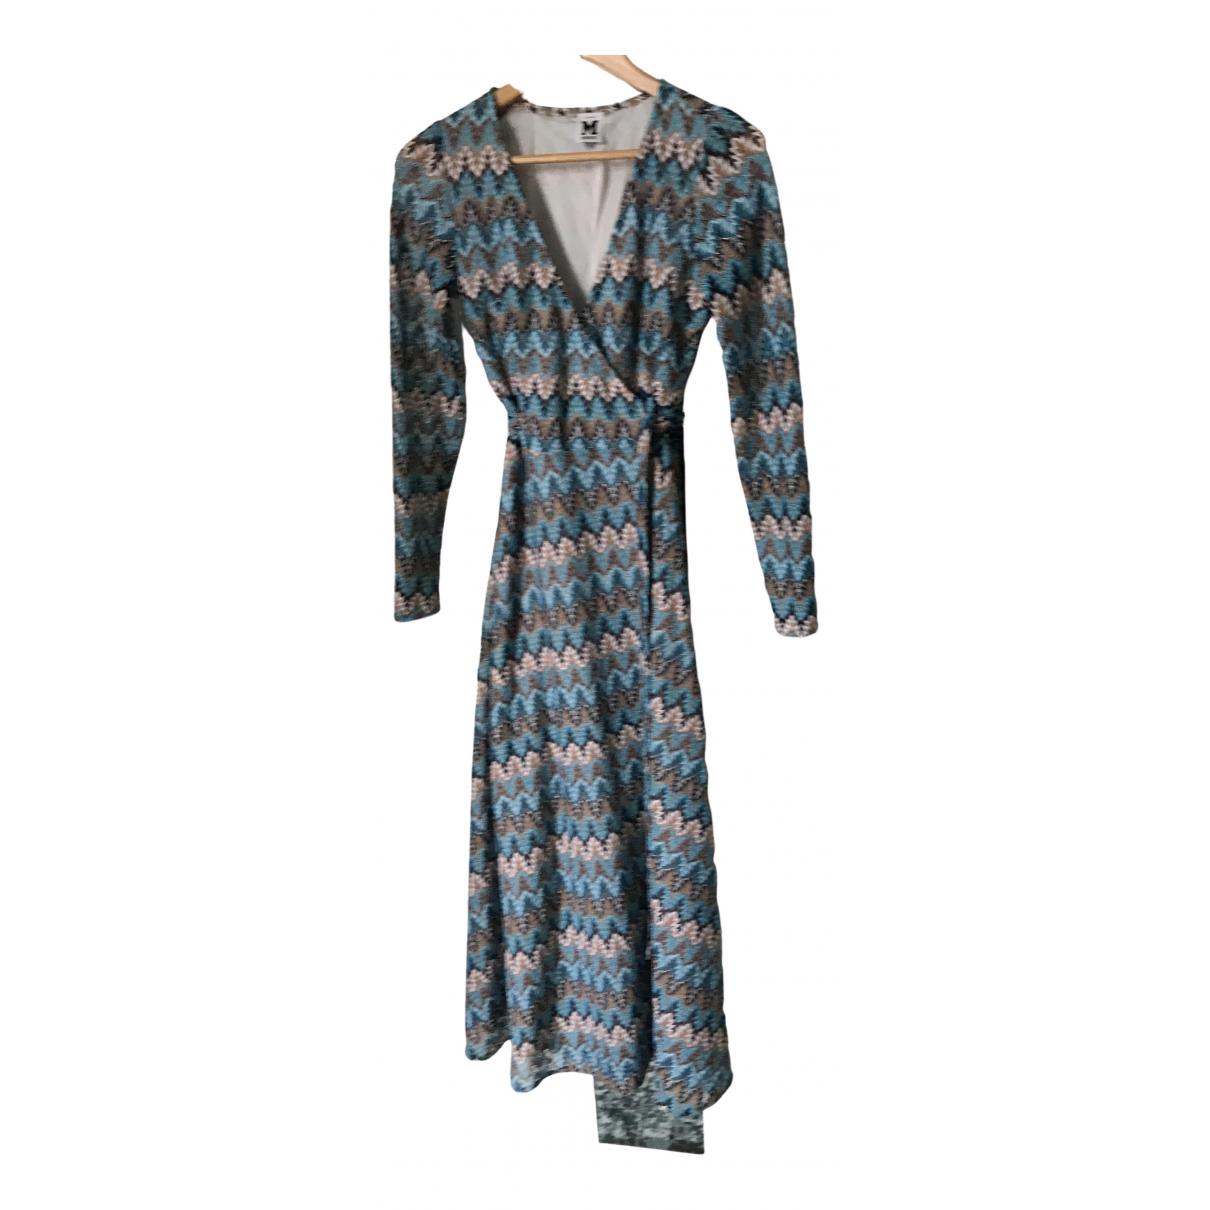 M Missoni \N Blue Cotton dress for Women S International